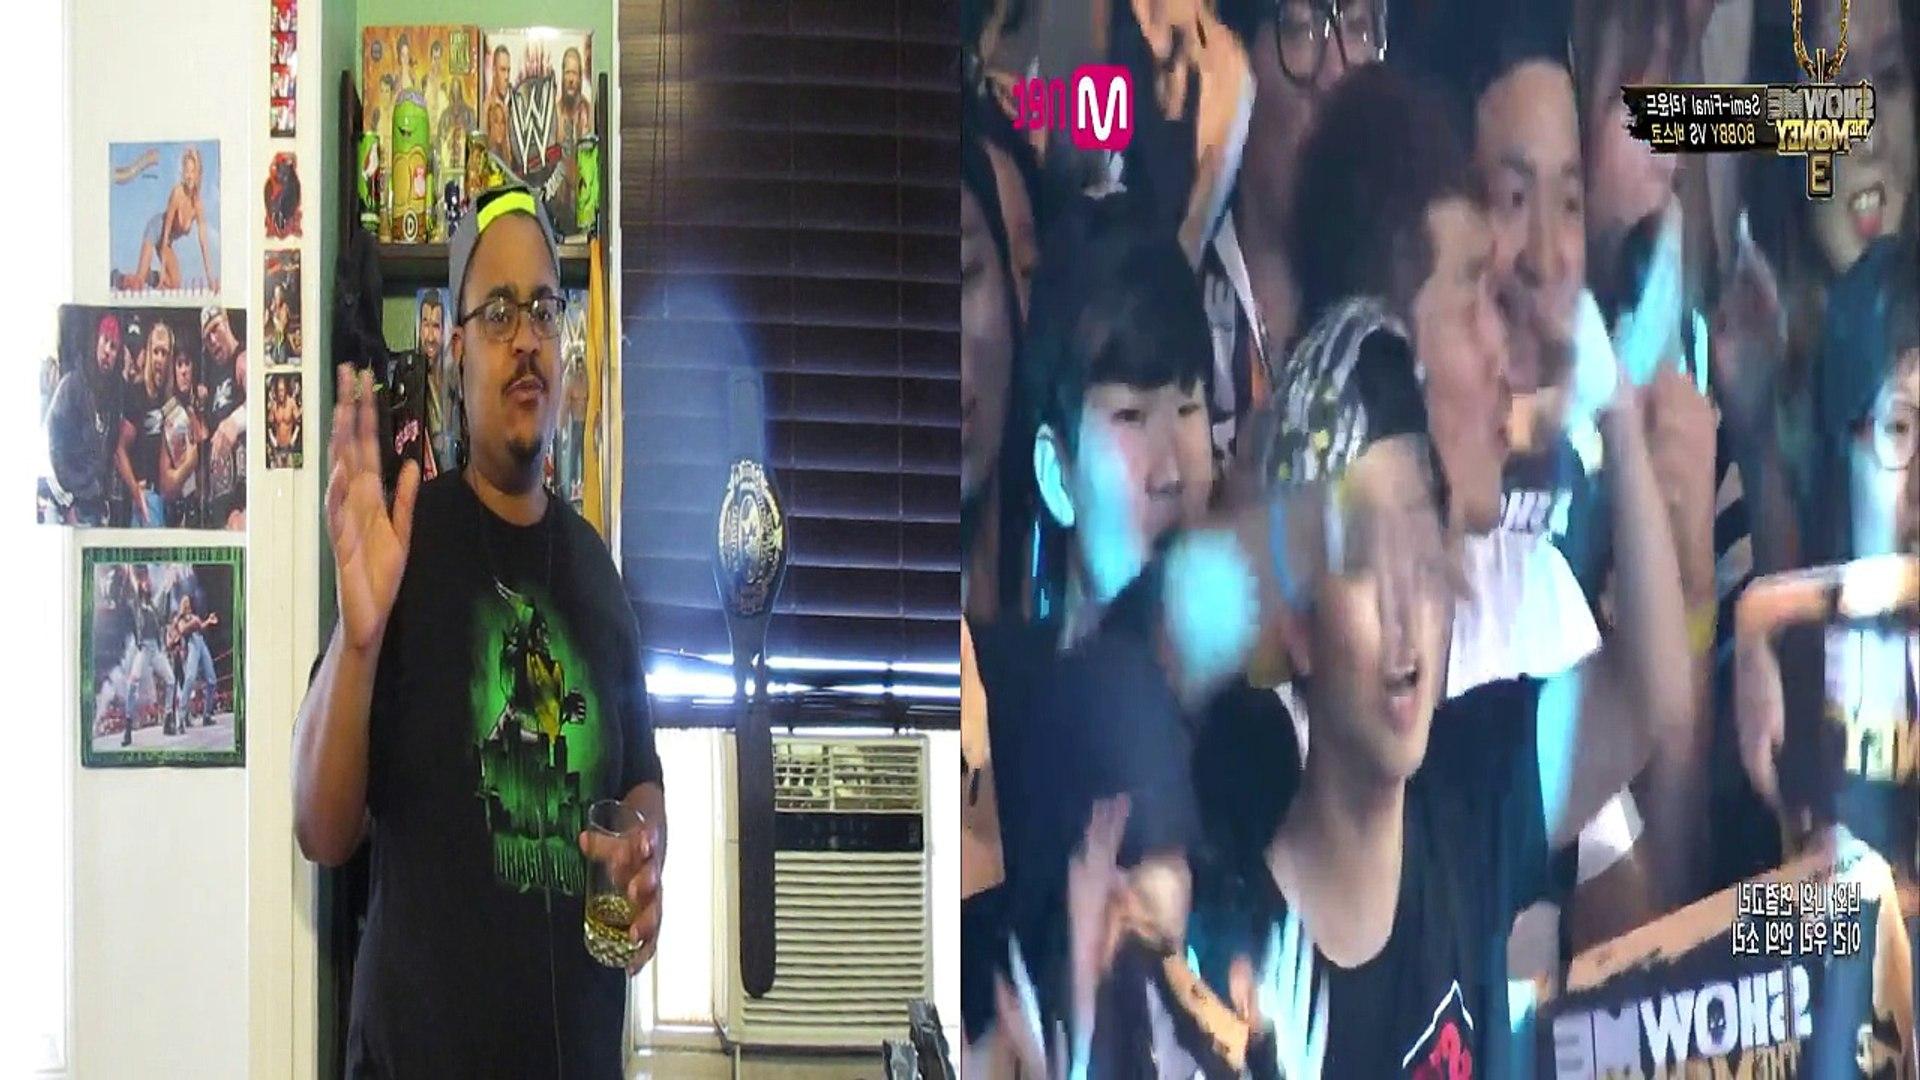 Mnet [쇼미더머니3] Ep.09 : BOBBY(바비) - 연결 고리 # 힙합 @ SEMI-FINAL Real-Time Review